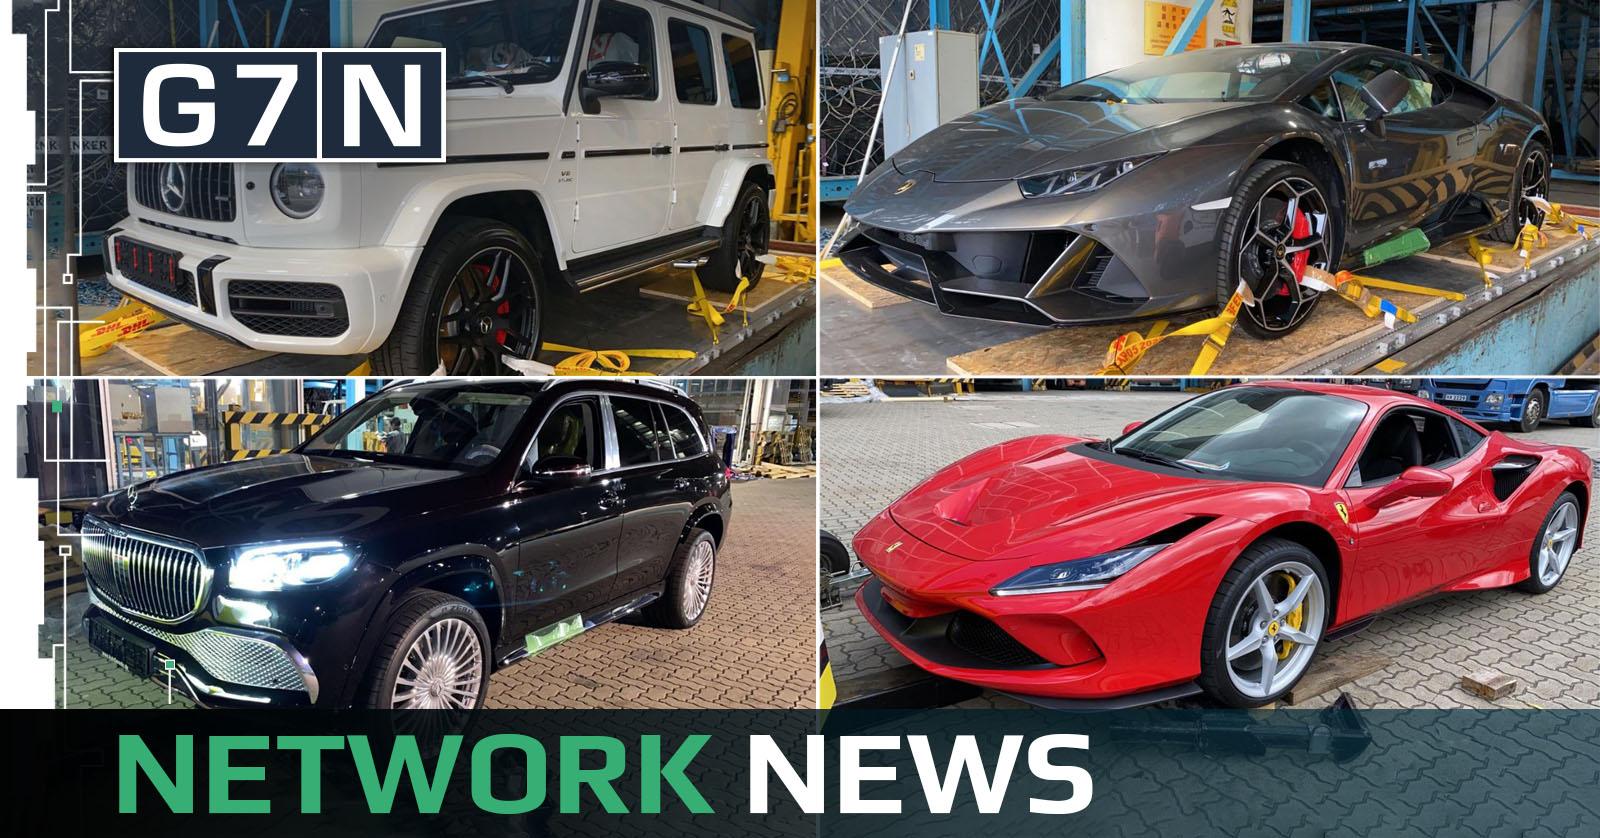 https://newg7dashboard.g7networks.com/news/news__290721_G7N_norman_NEWS.jpg